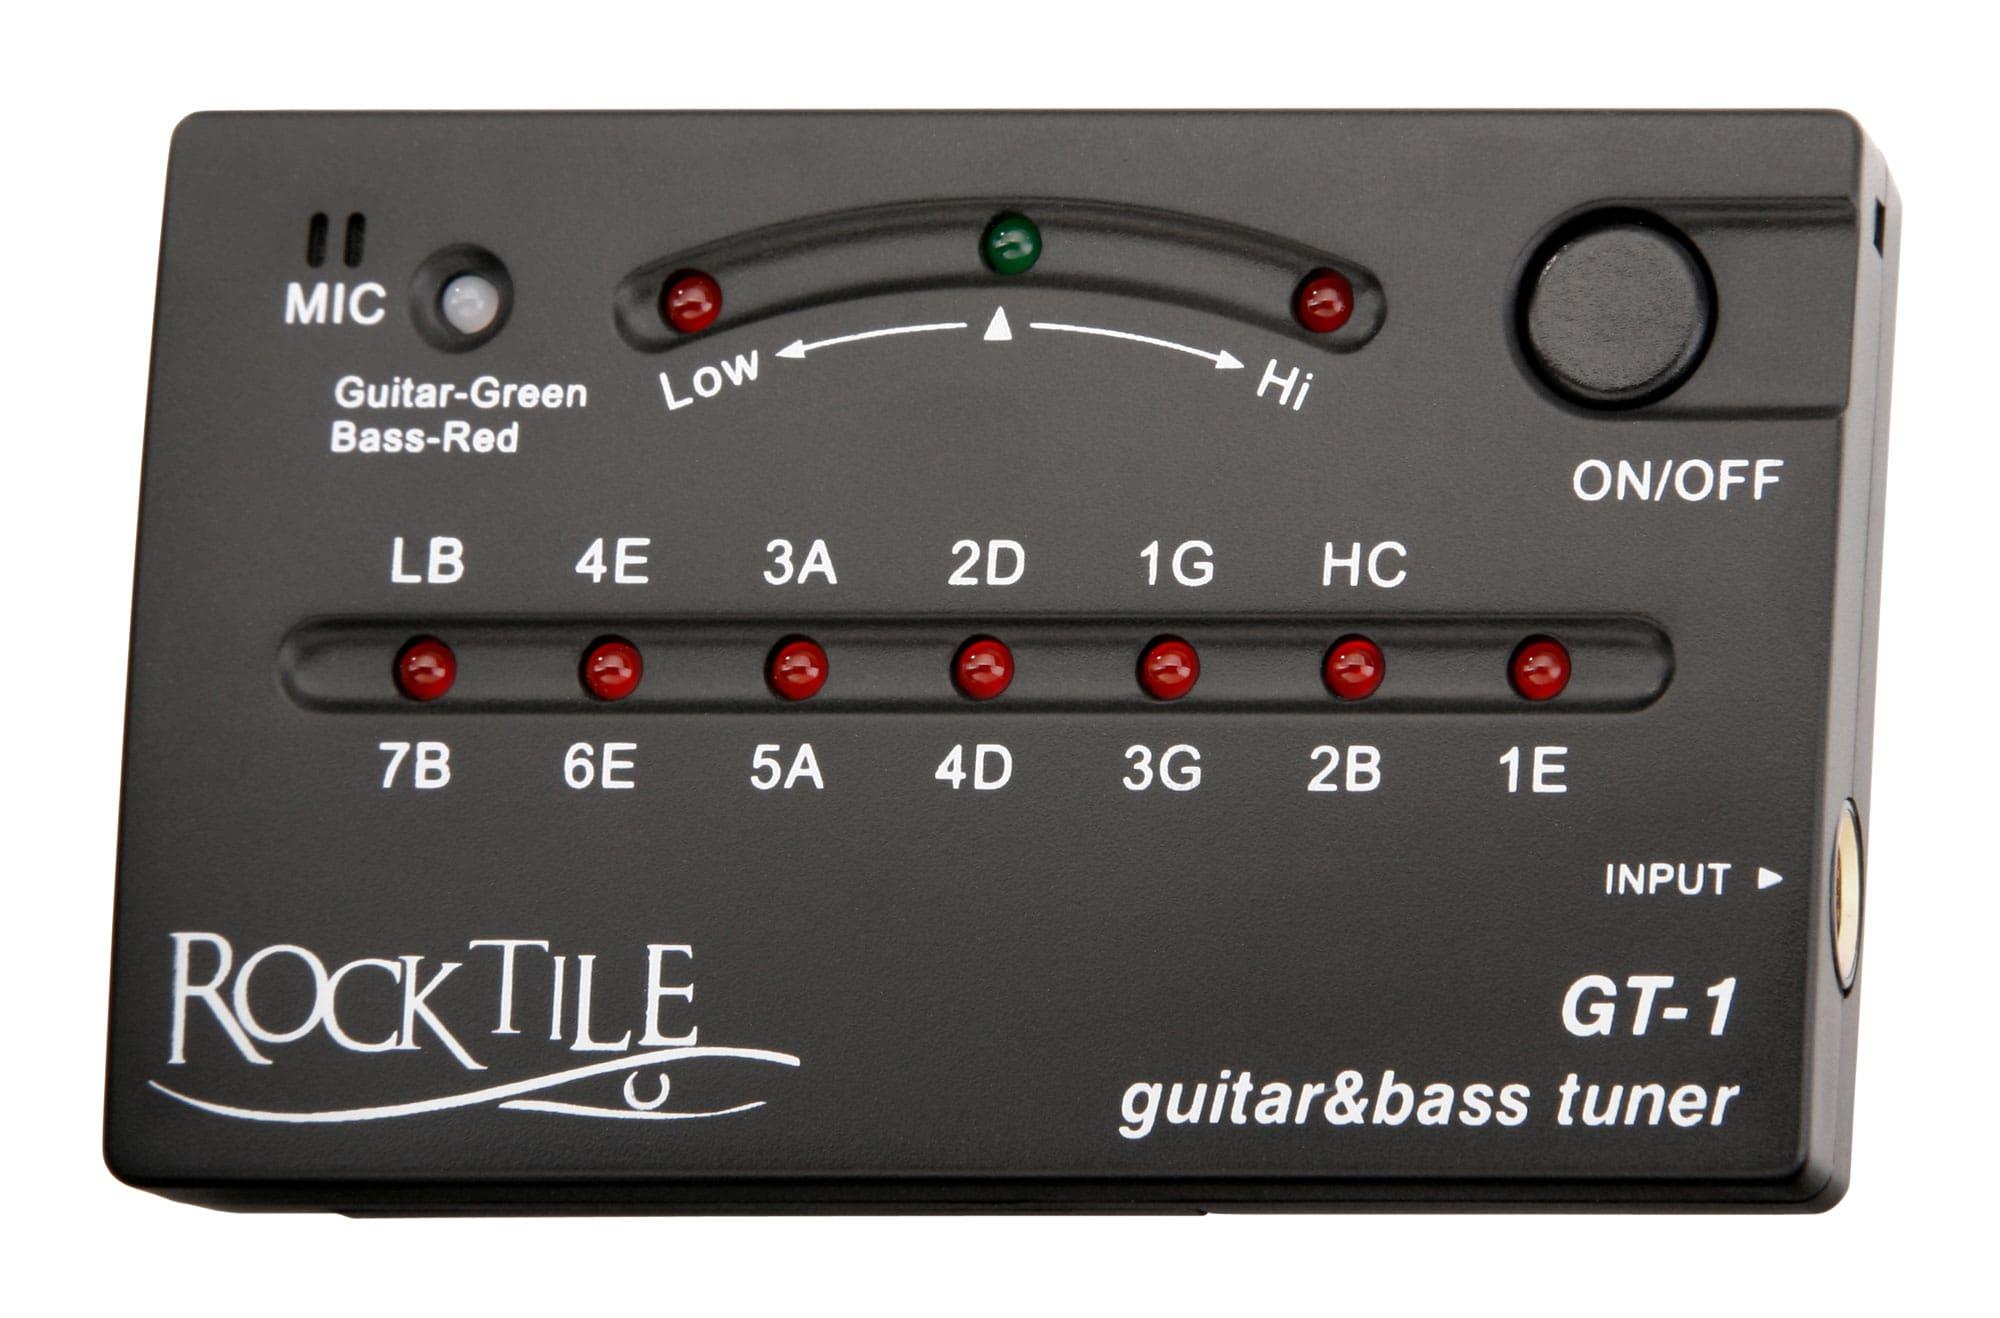 Musikerzubehoer - Rocktile GT 1 Stimmgerät für Gitarre Bass - Onlineshop Musikhaus Kirstein